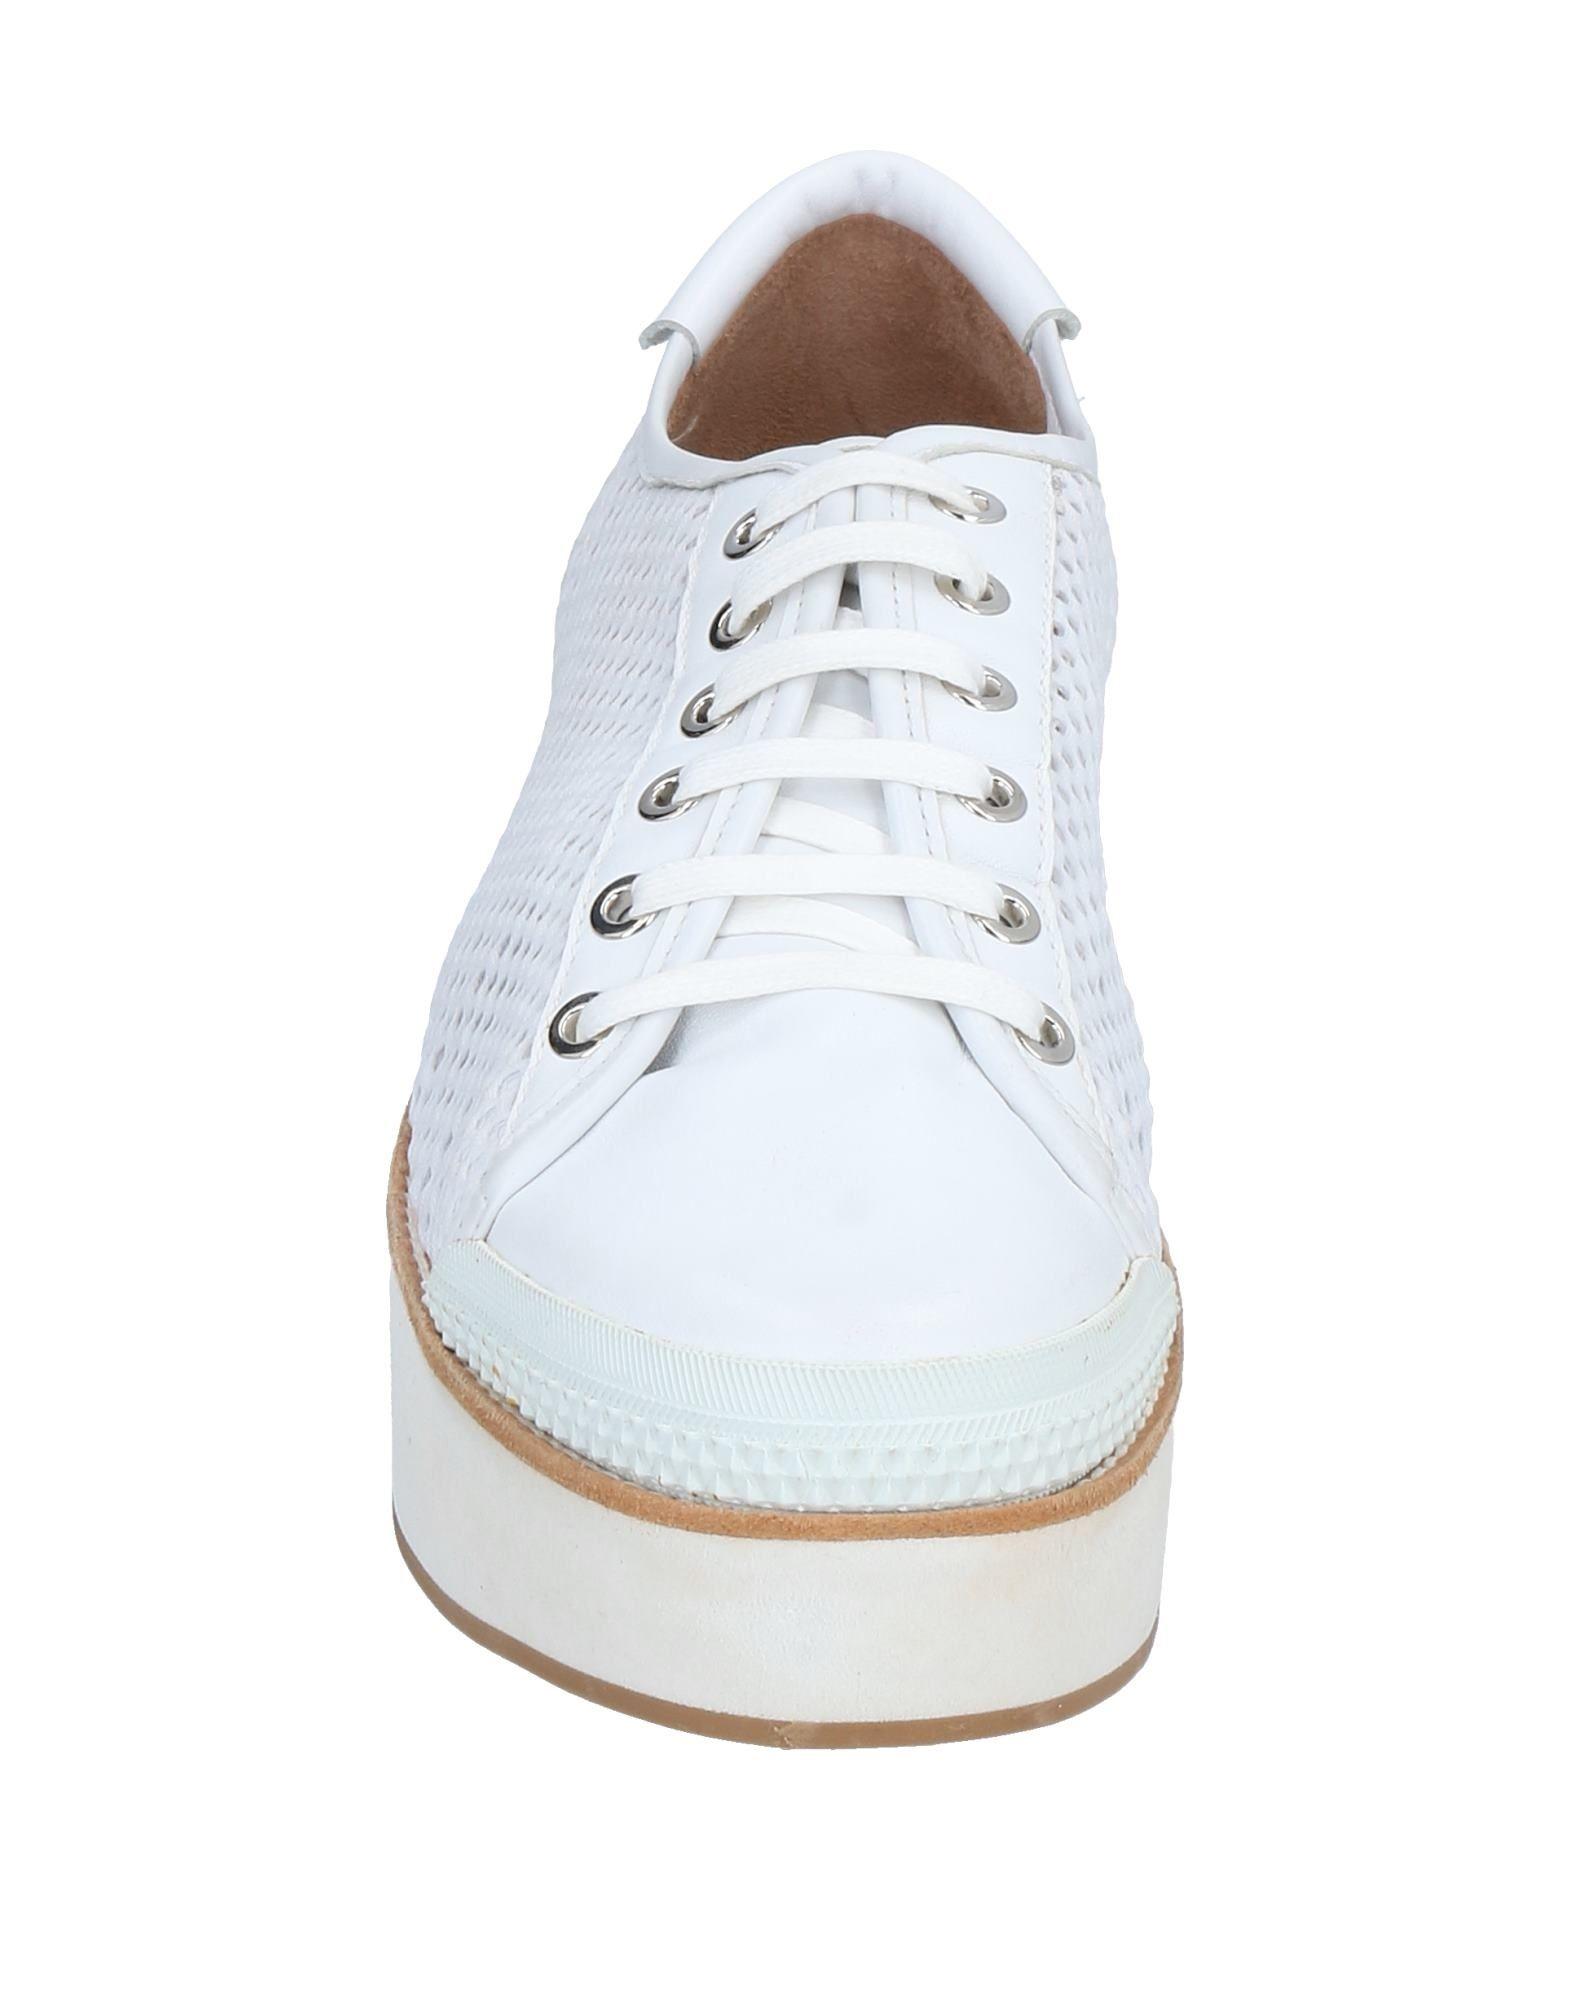 Stilvolle Damen billige Schuhe Flamingos Sneakers Damen Stilvolle  11512771FE 9252b8